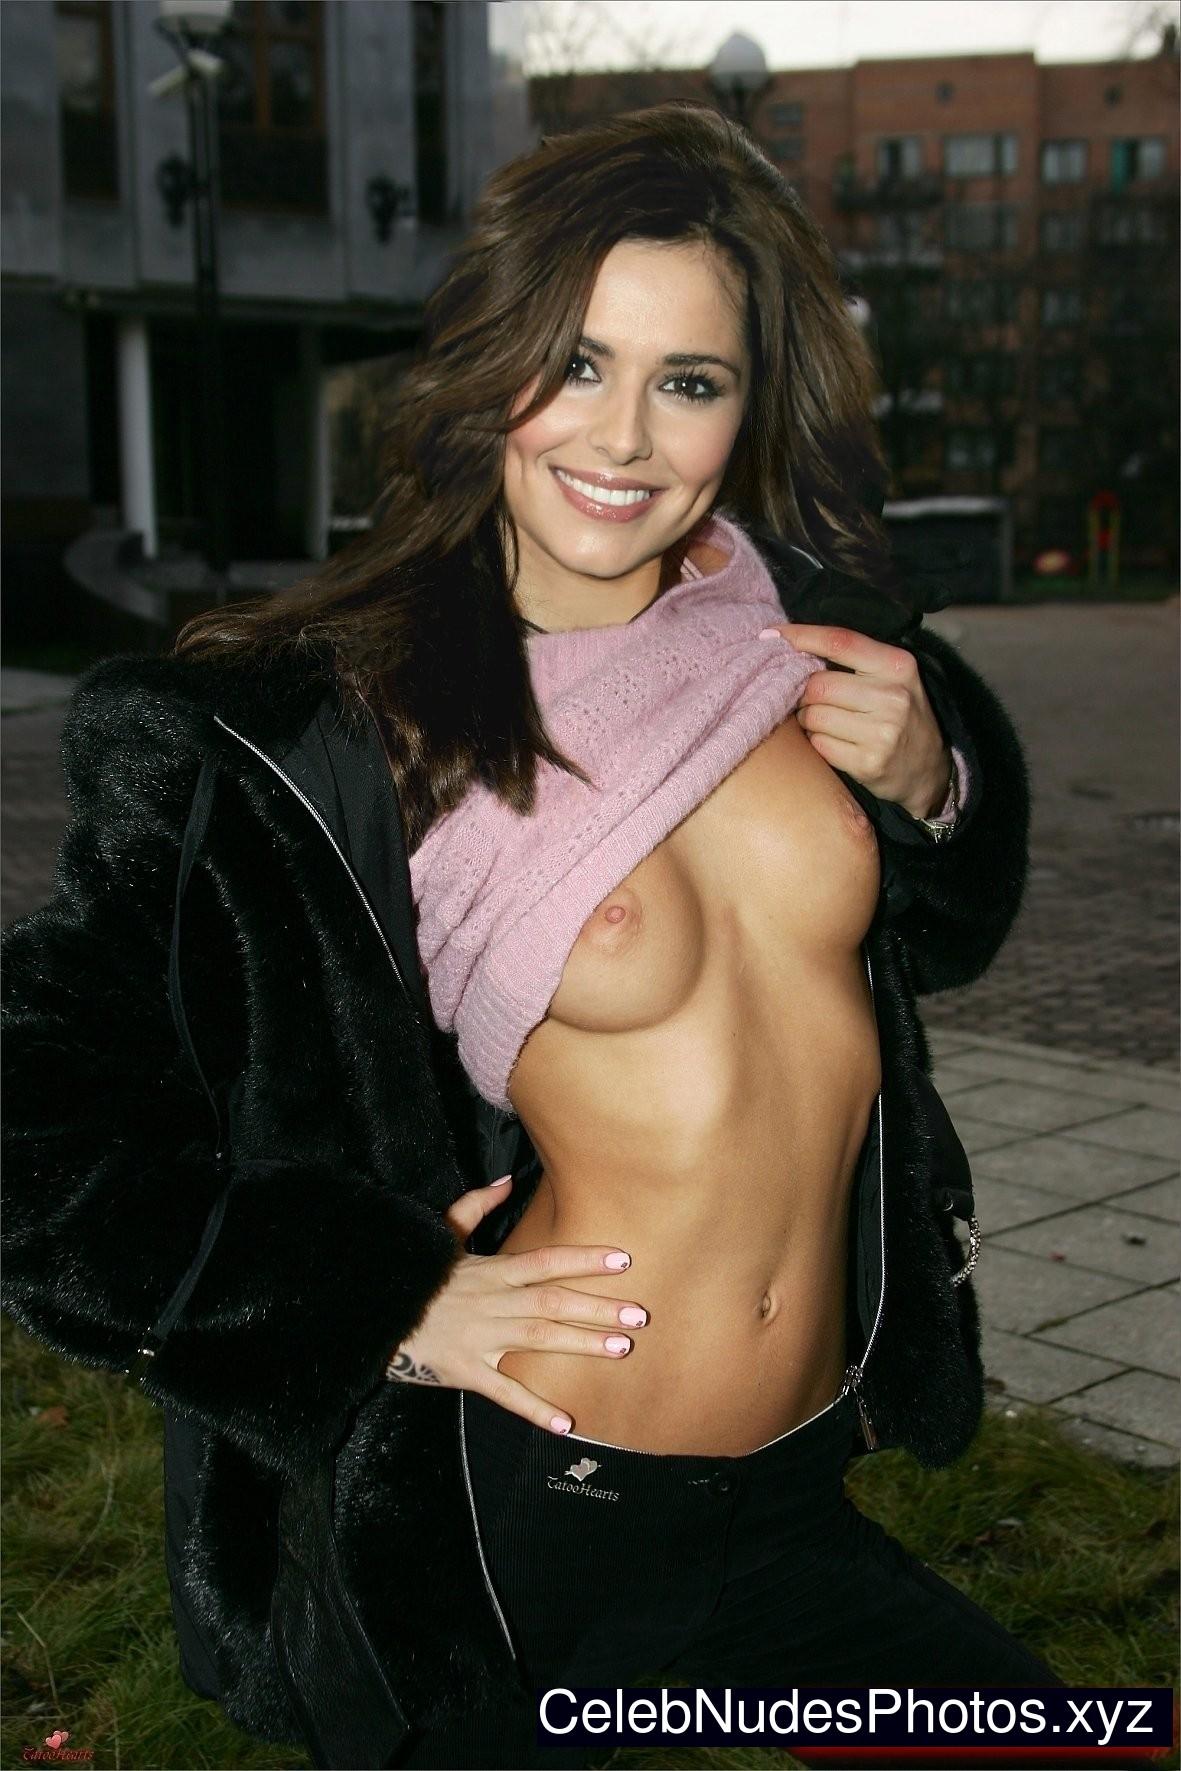 Celebrity Cheryl Tweddy Nude Gif